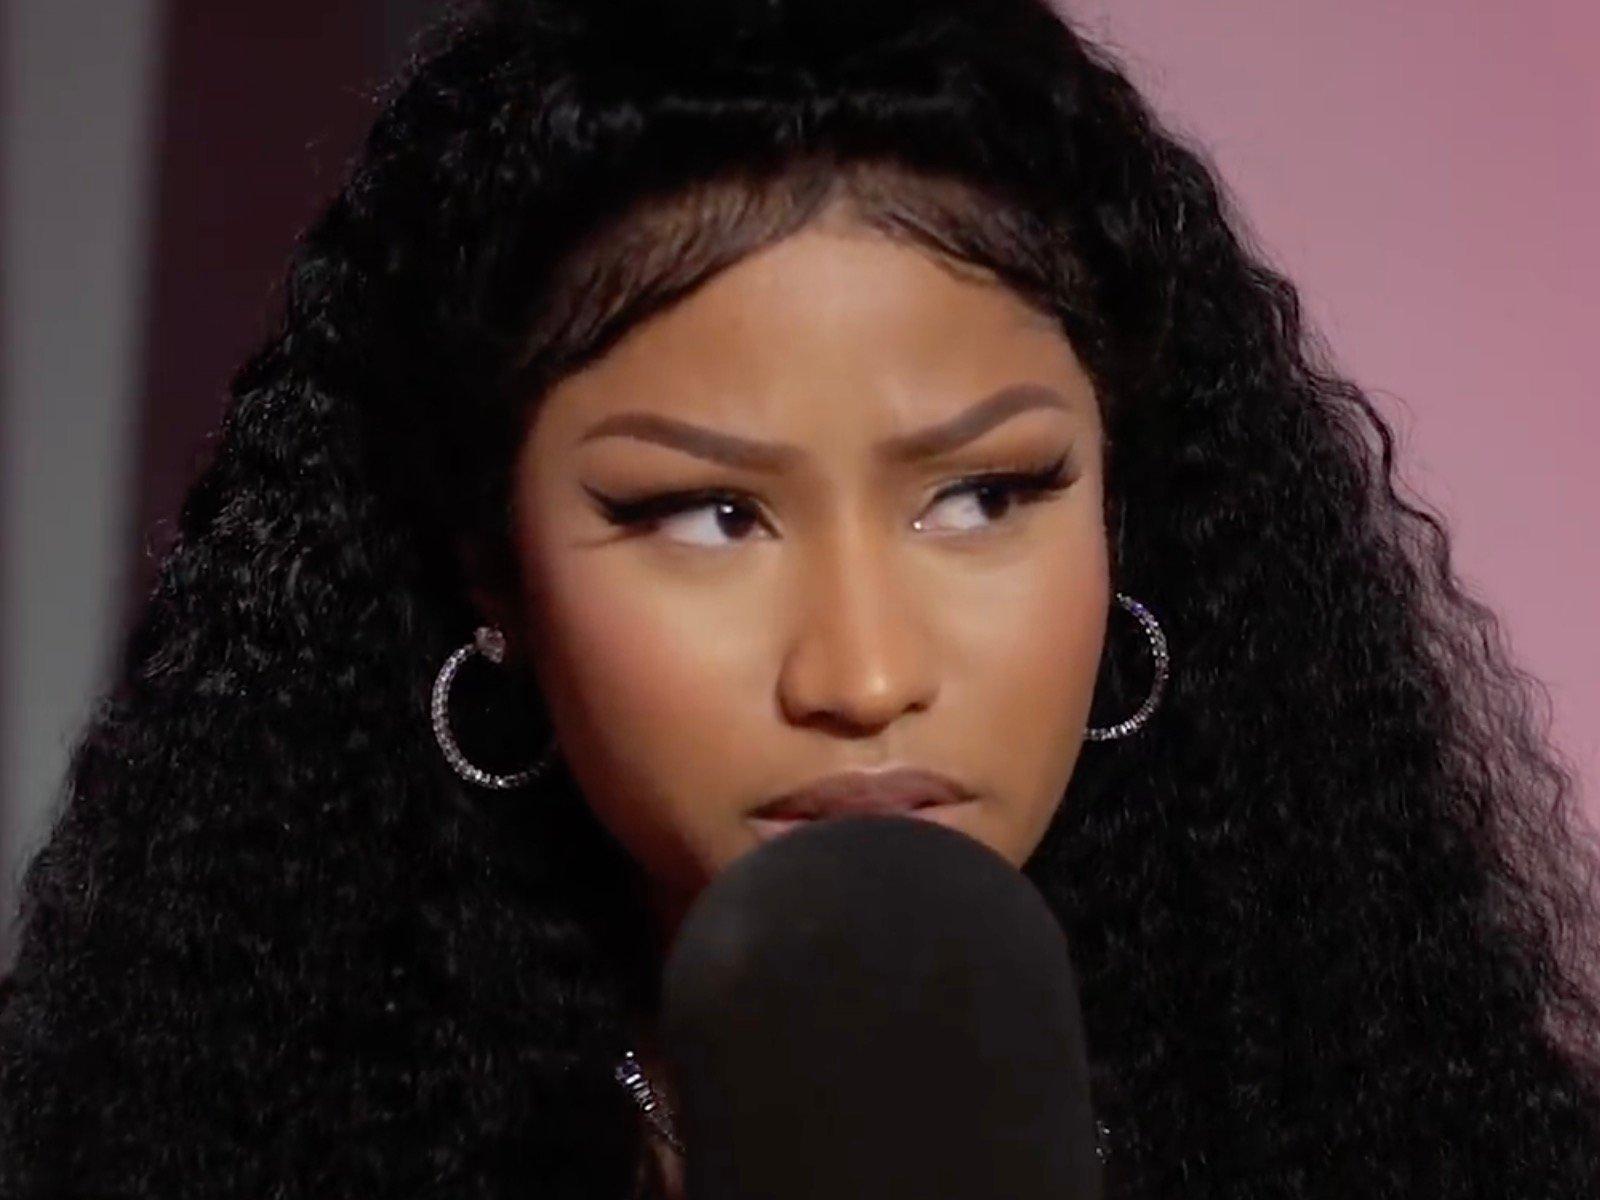 Nicki Minaj Destroys Female Fan After Petty Body Shaming ...